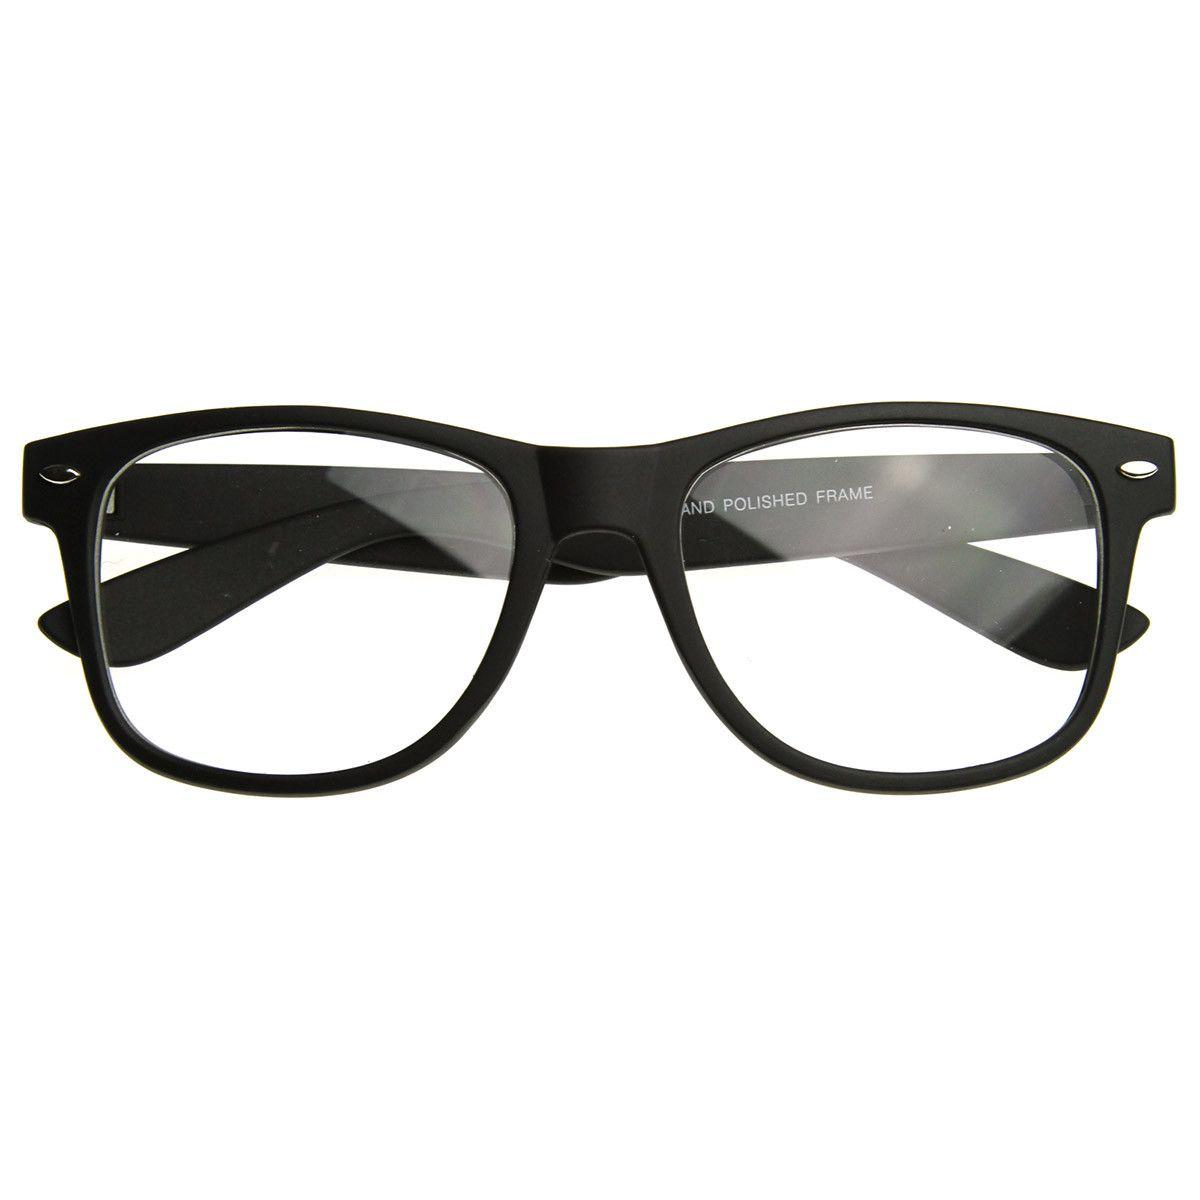 b60e6800b86e Matte Black Horned Retro Style Clear Lens Glasses w  Soft Finish Rubber  Coating